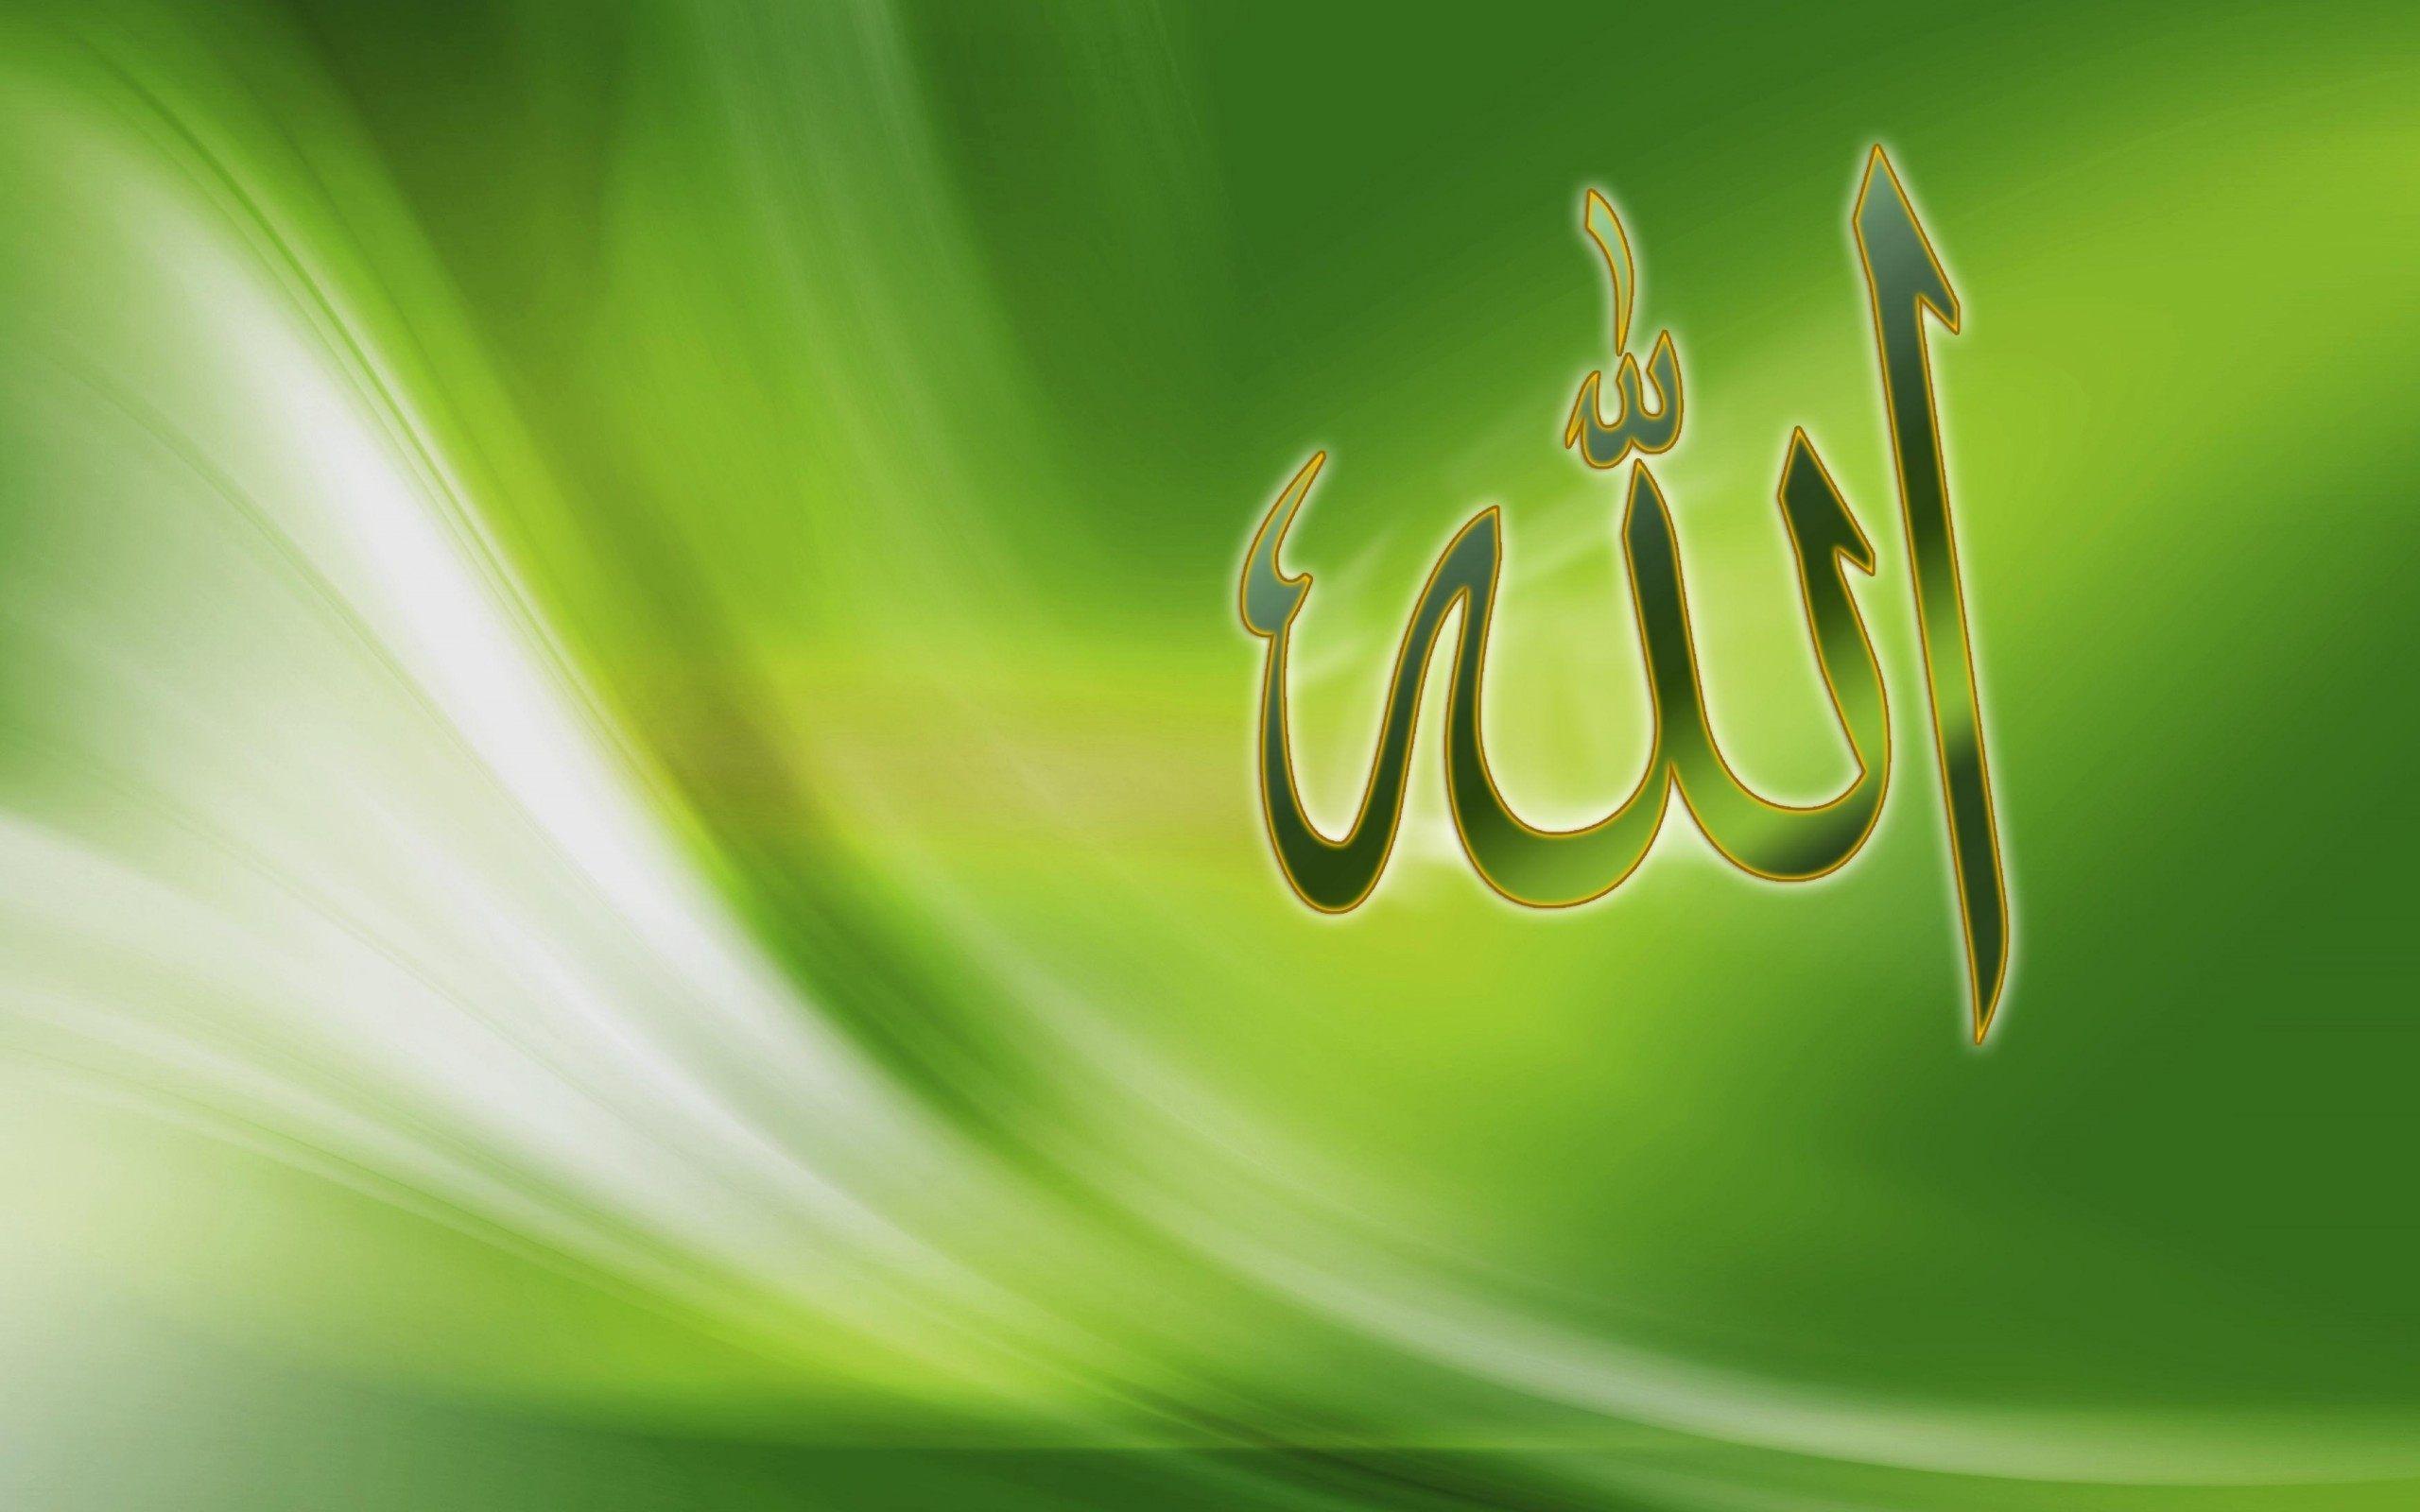 Live Moving Wallpapers In Hd For Desktop Name Wallpaper Allah